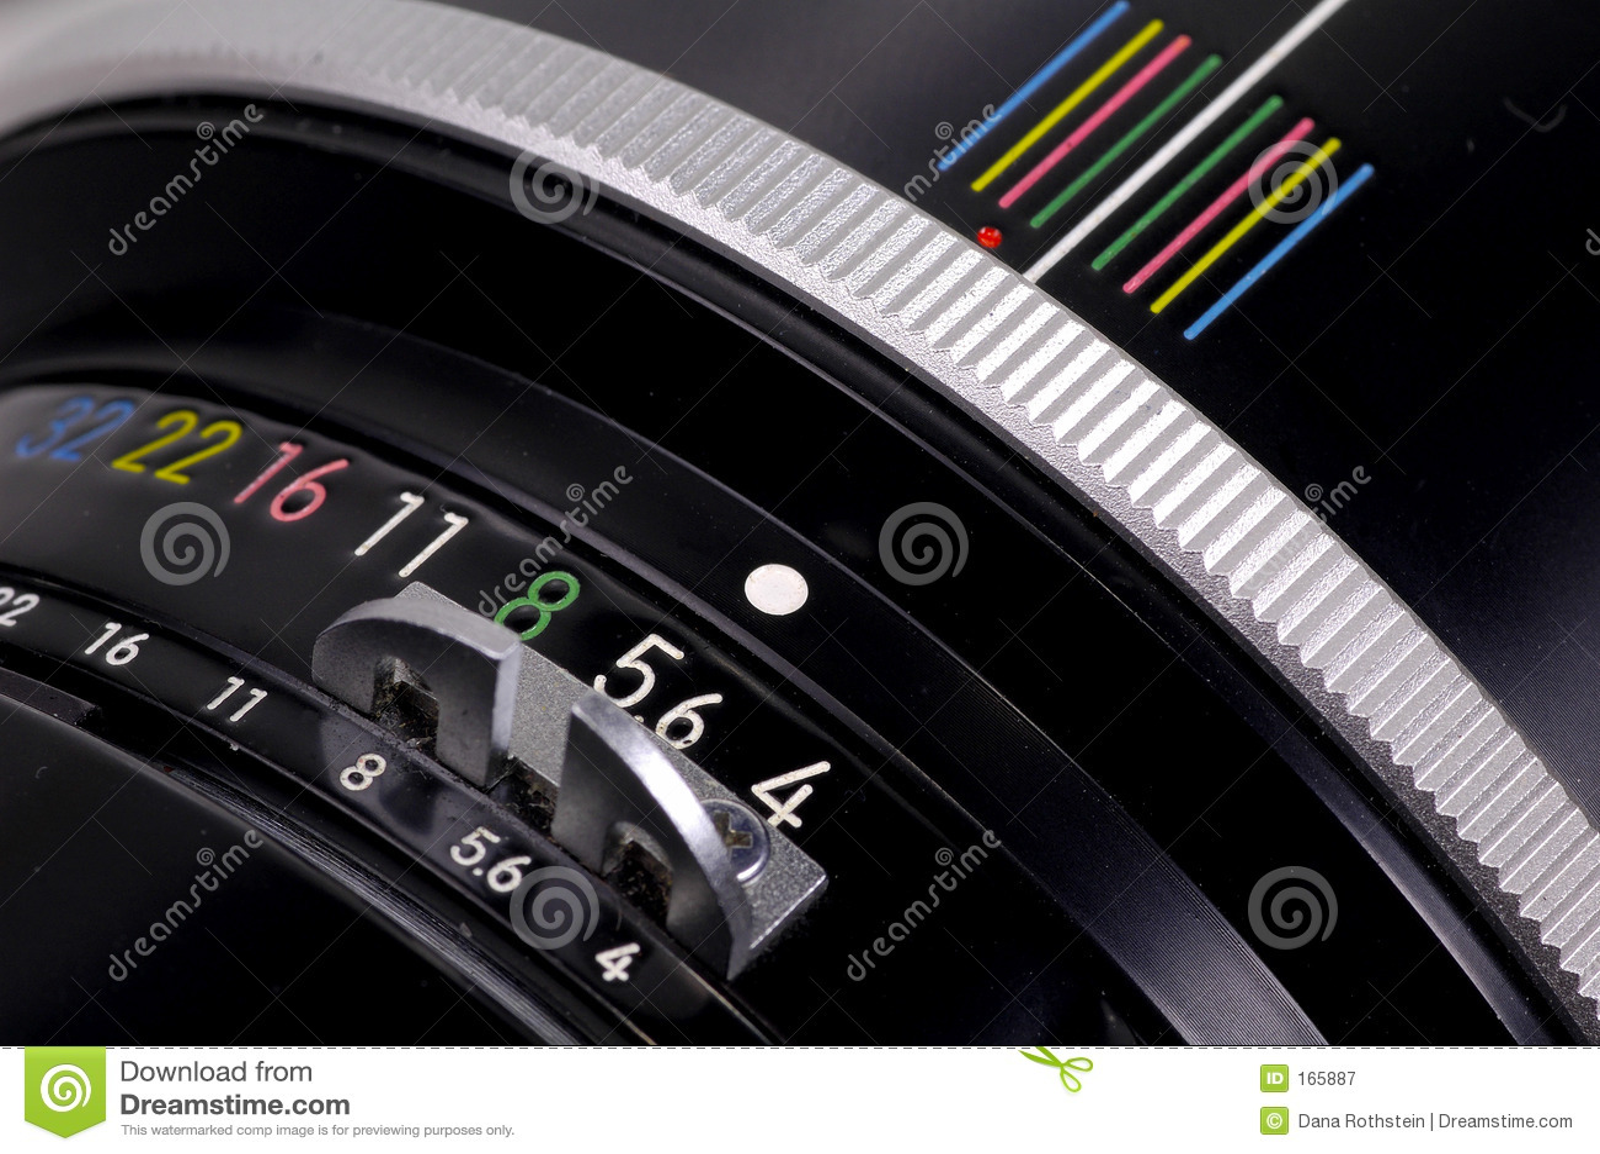 Manual Lense